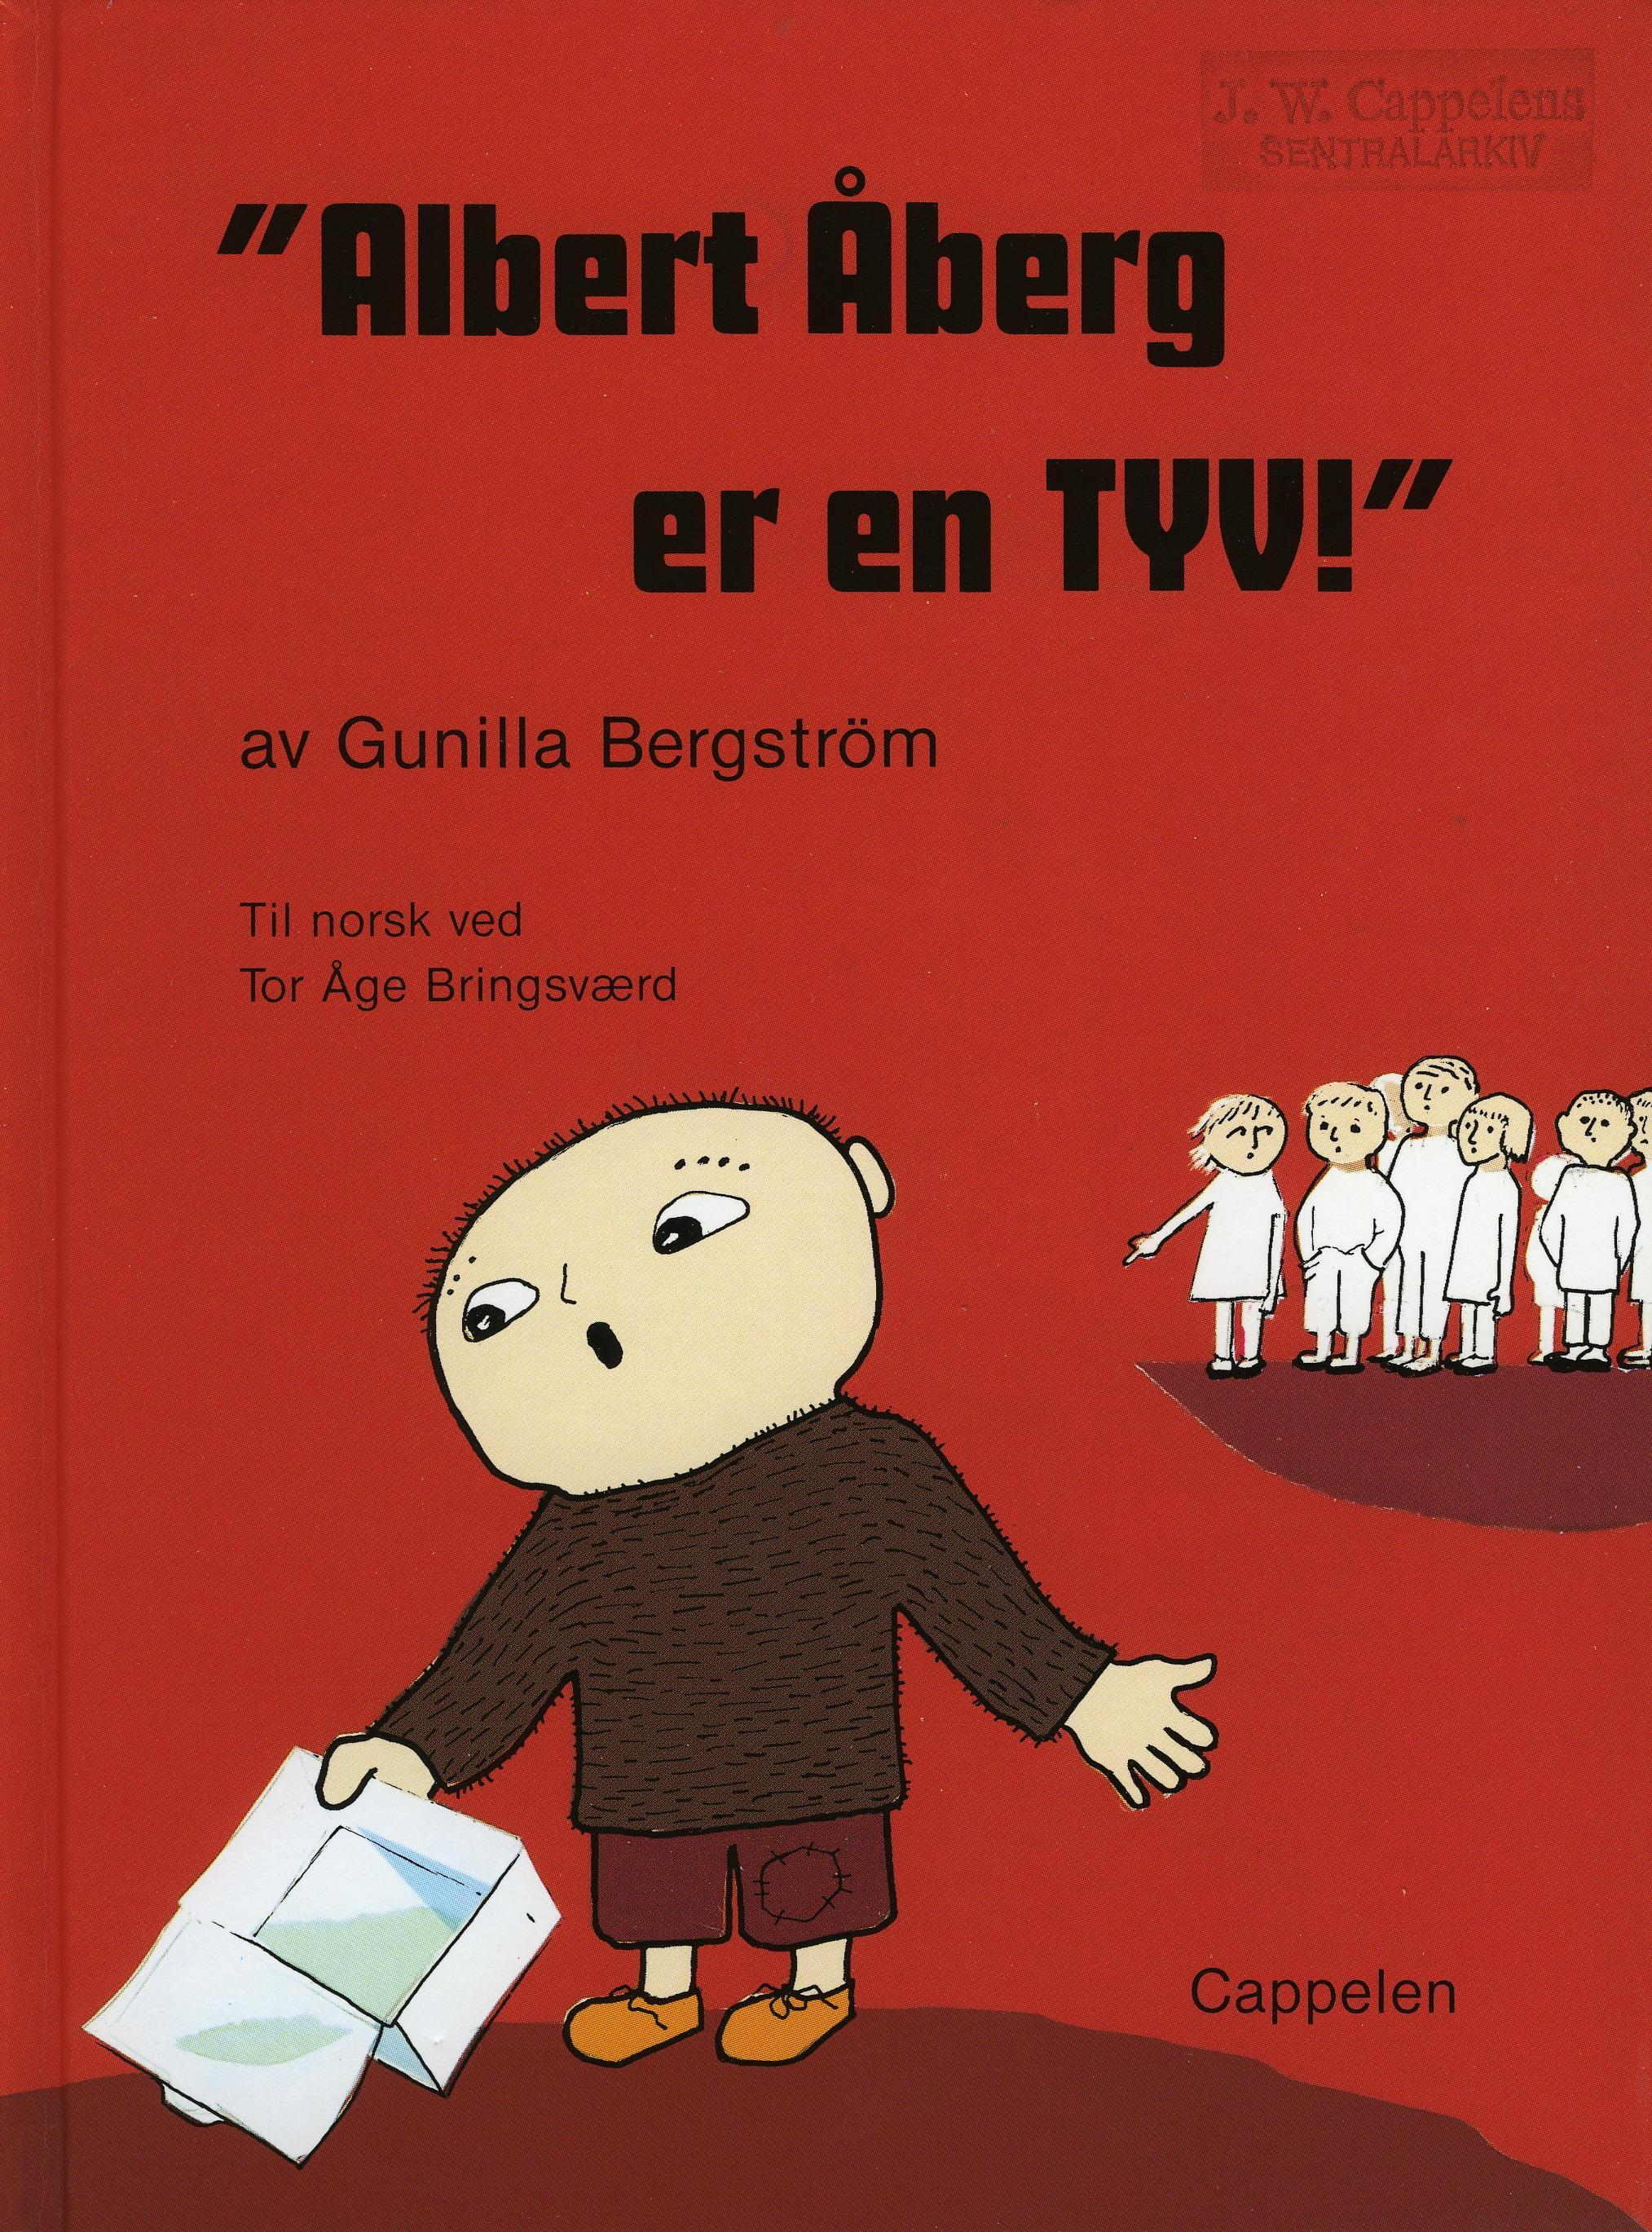 """Albert Åberg er en tyv!"" av Gunilla Bergström"